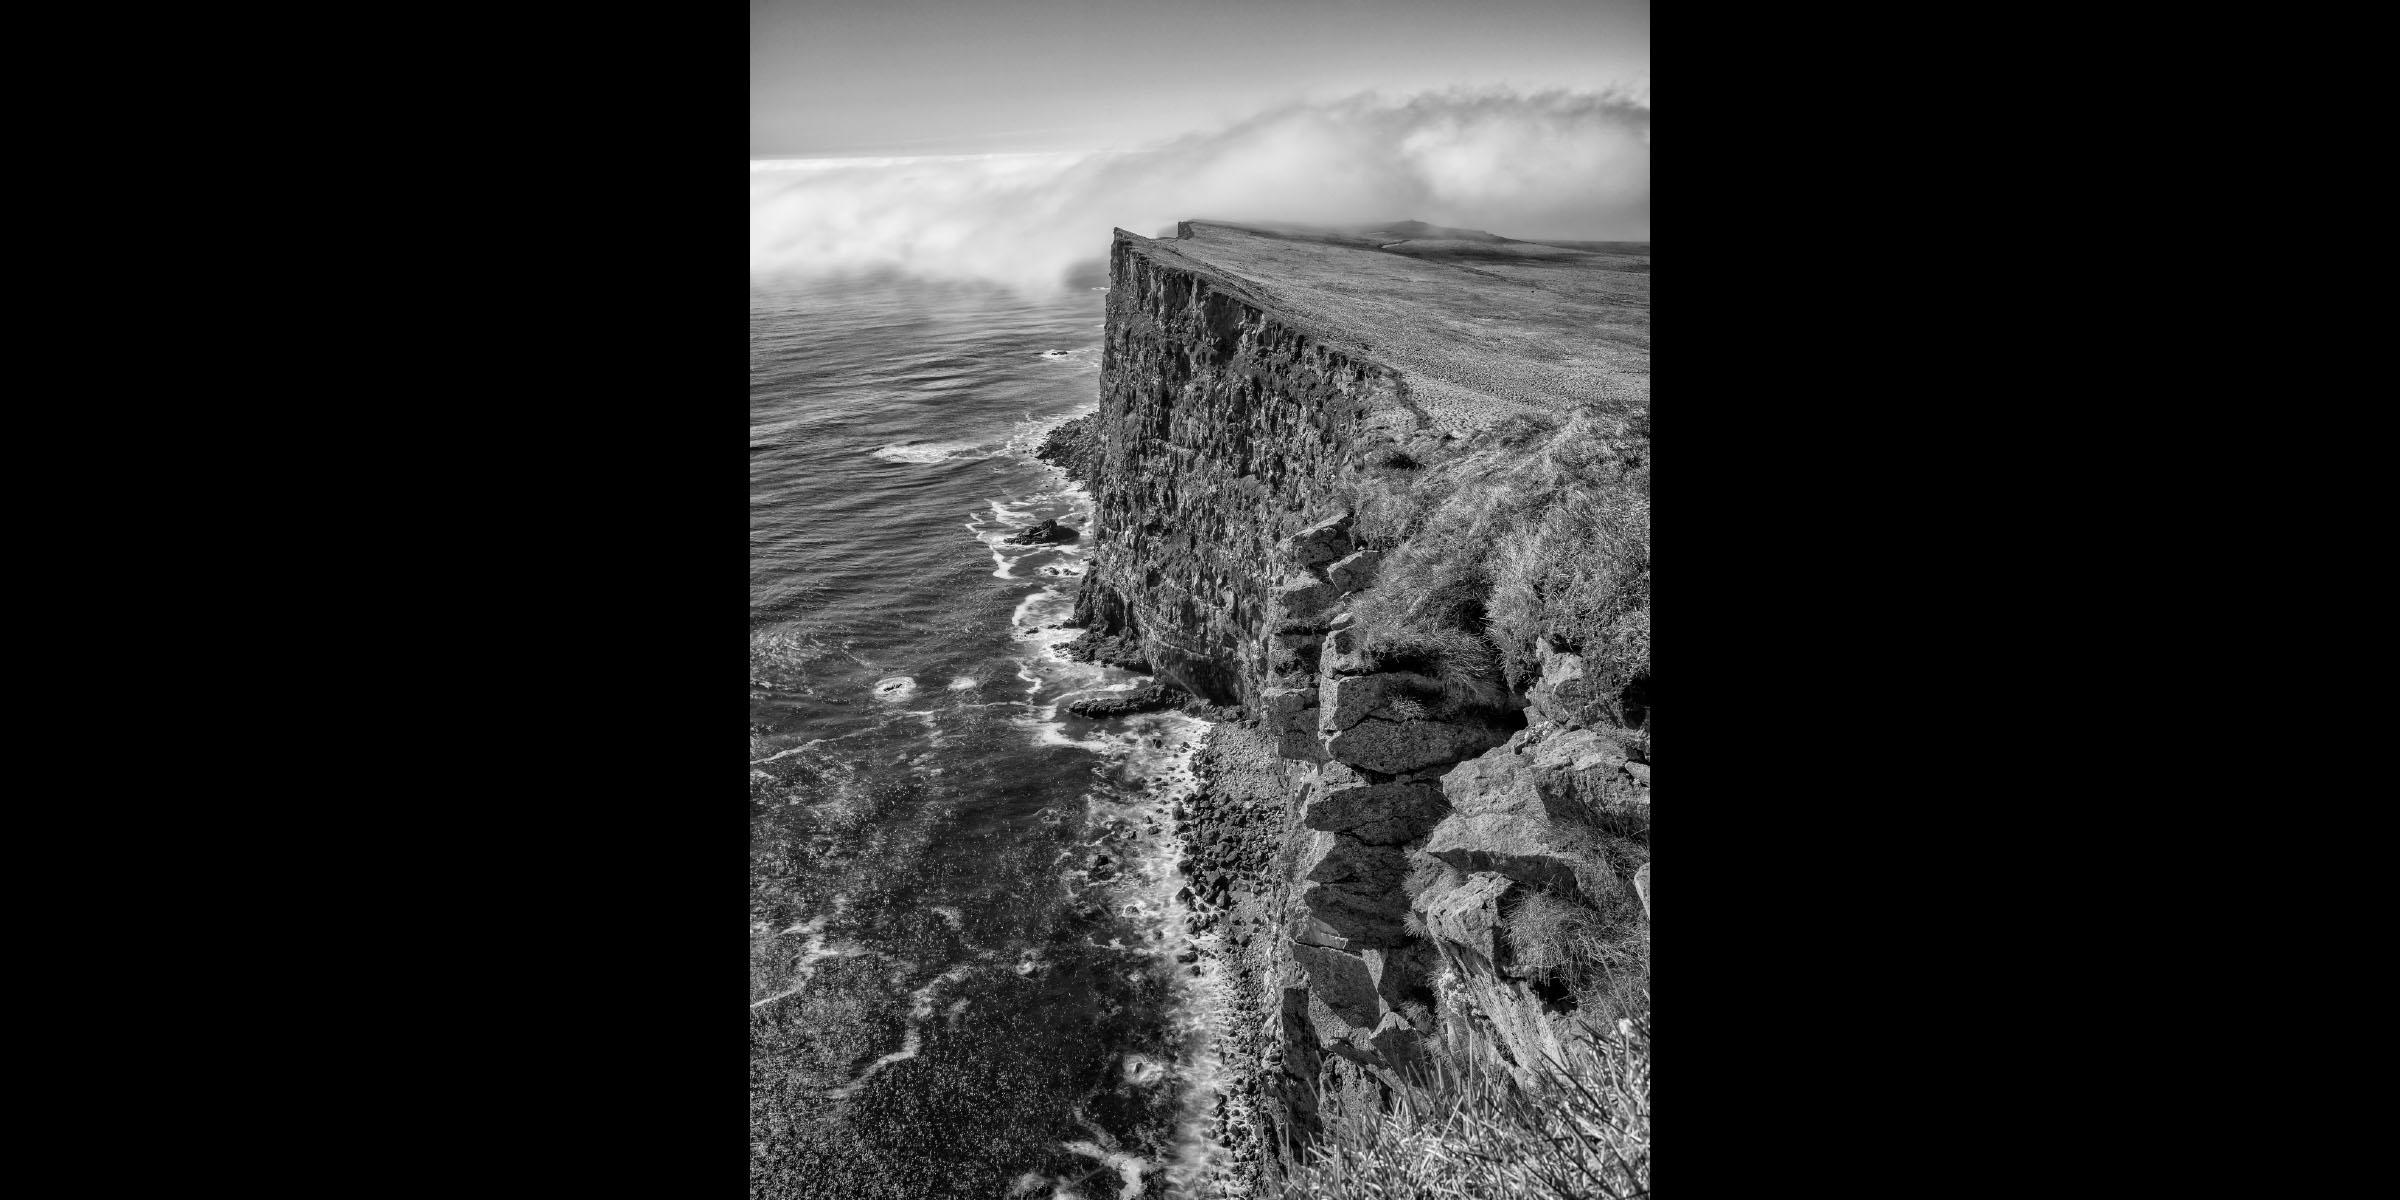 Latrabjarb Cliff and Fog